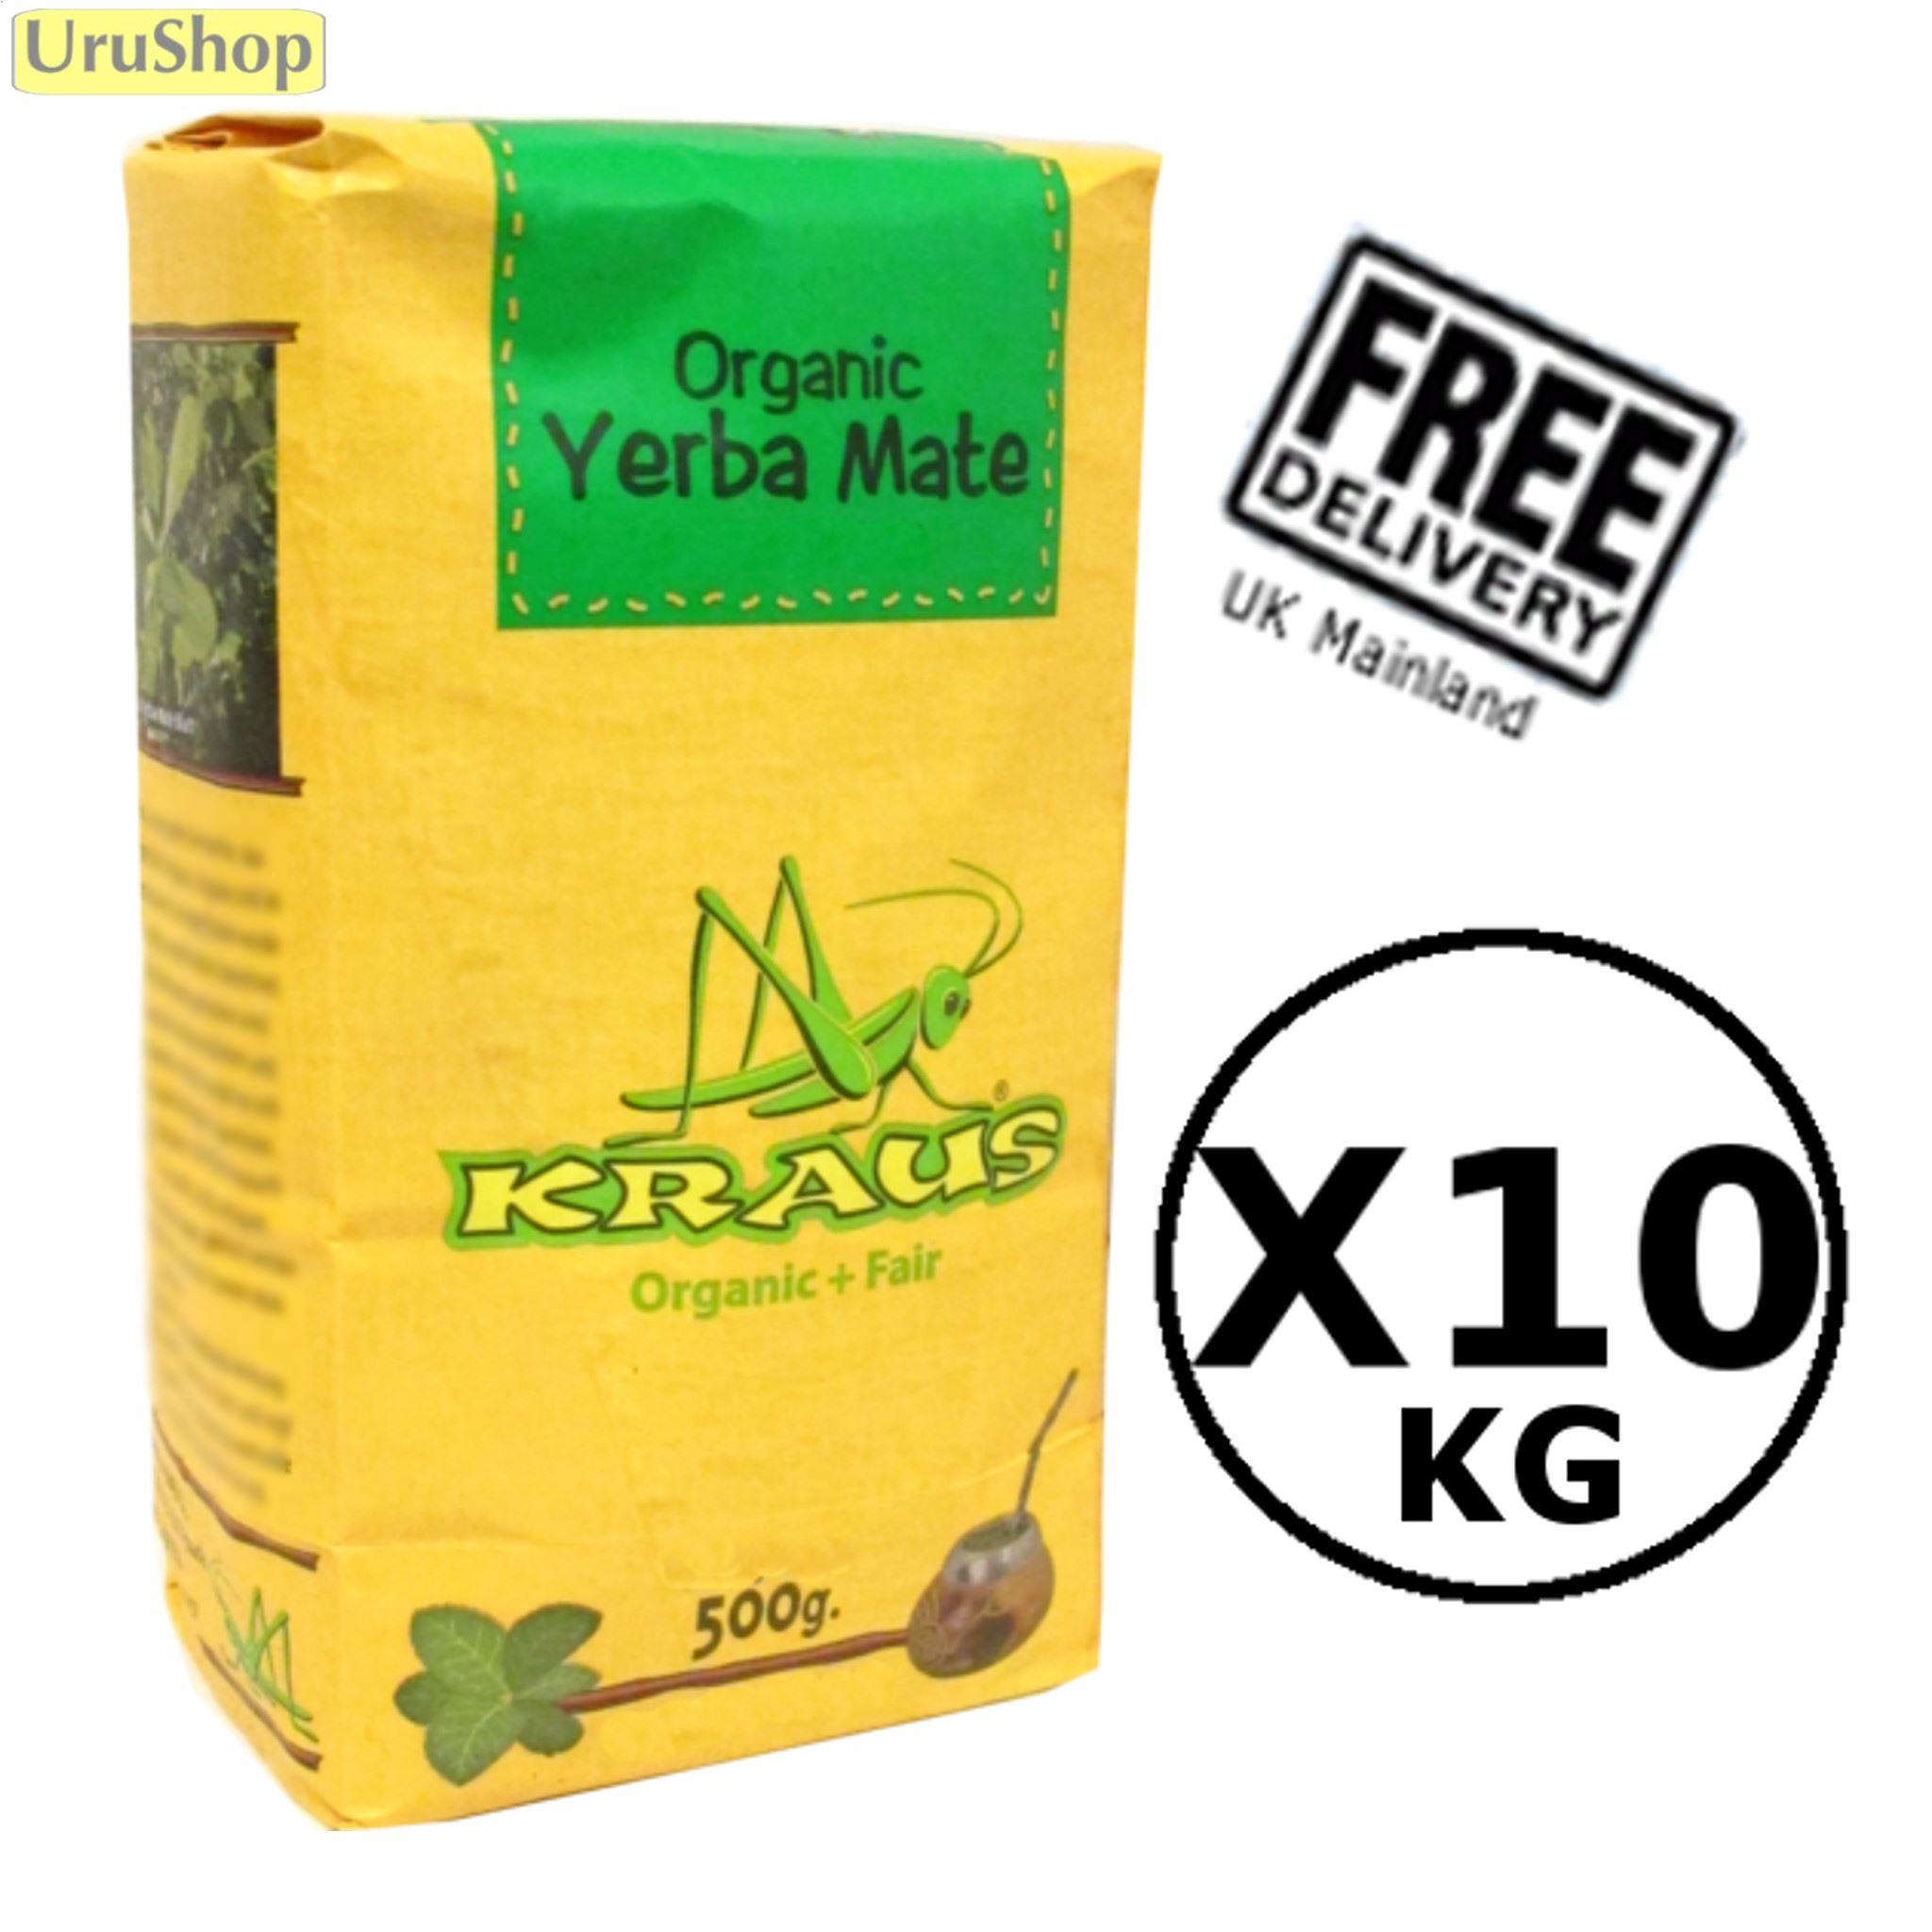 Bodymate herbal loss product weight - Value 10kg Kraus Organic Yerba Mate